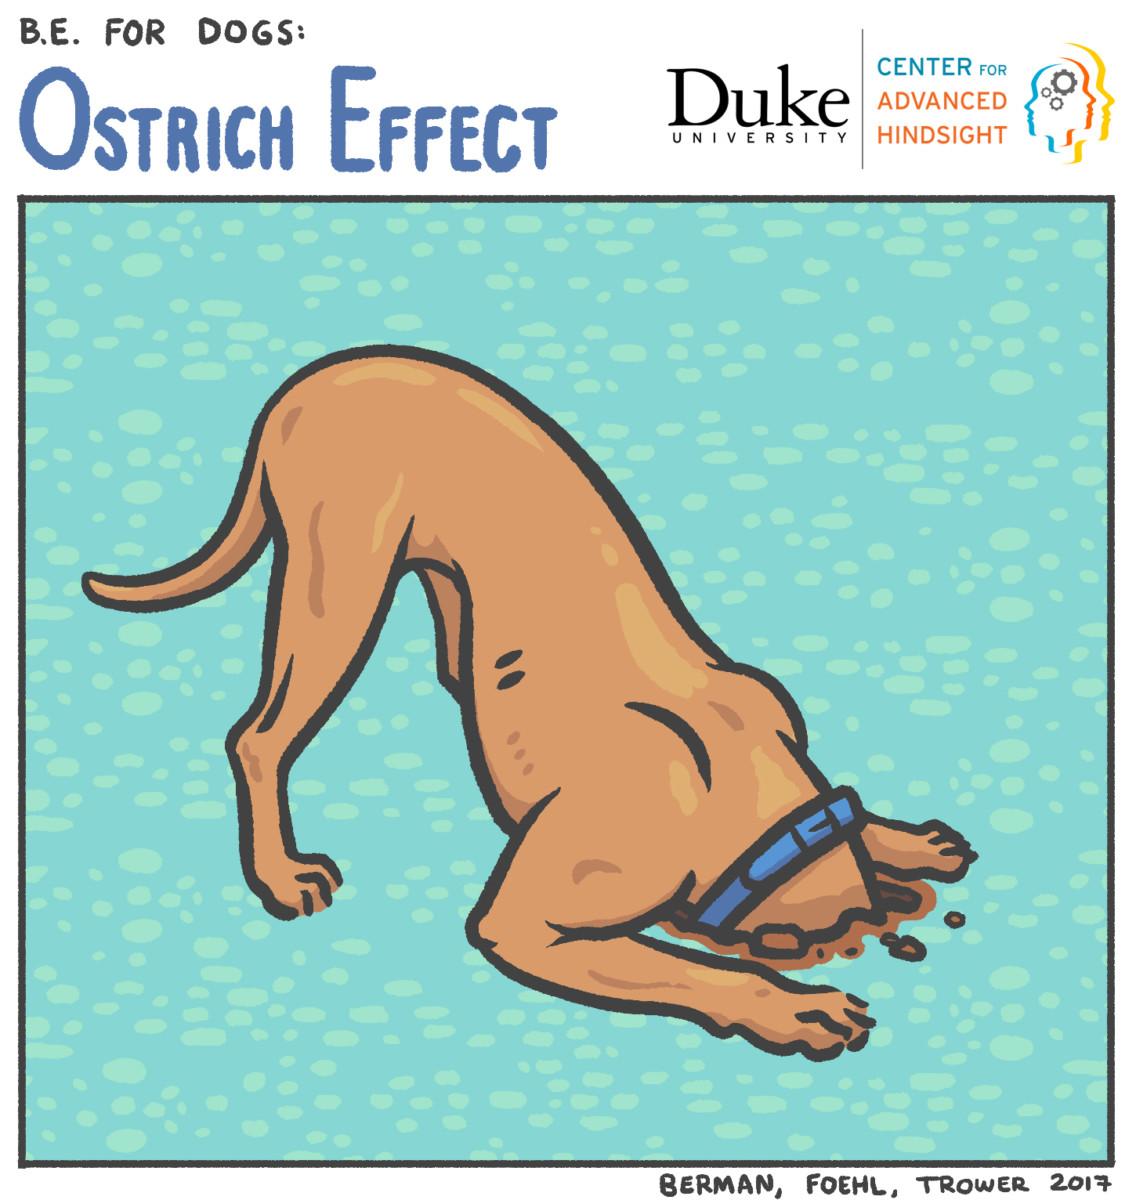 The ostrich effect | Behavioral Economics